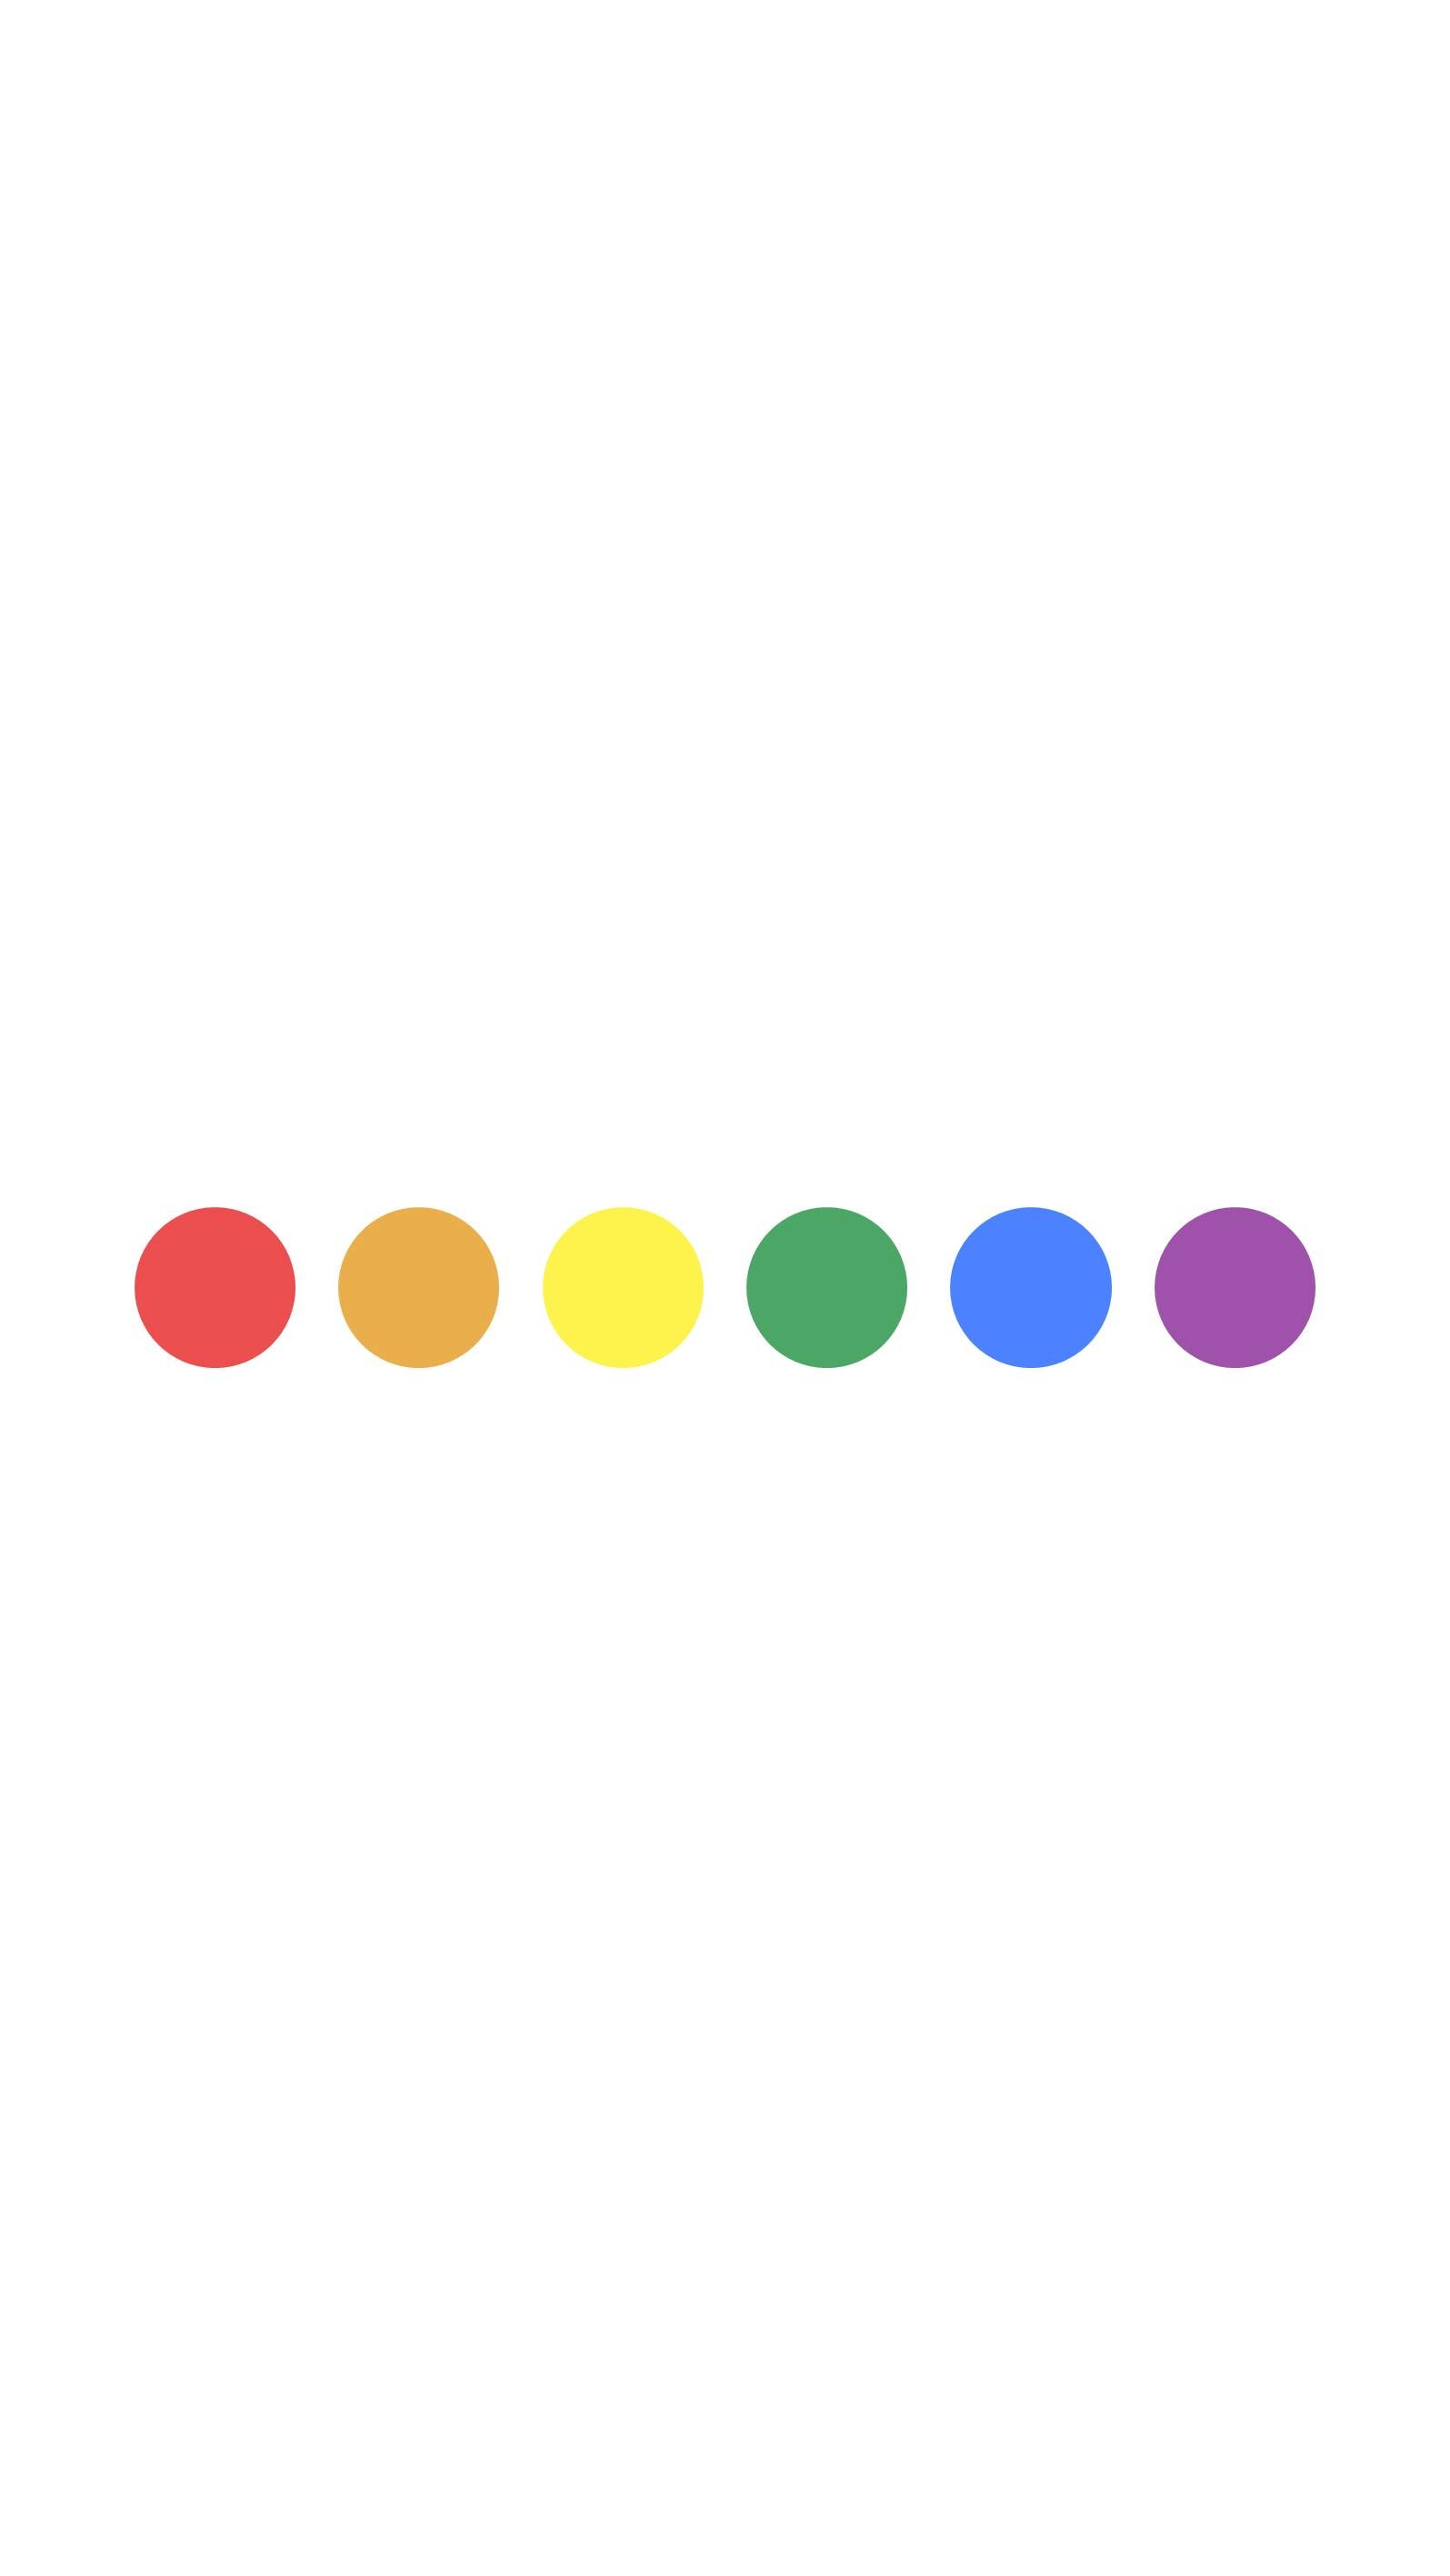 iPhone wallpaper rainbow pride Gay lesbian